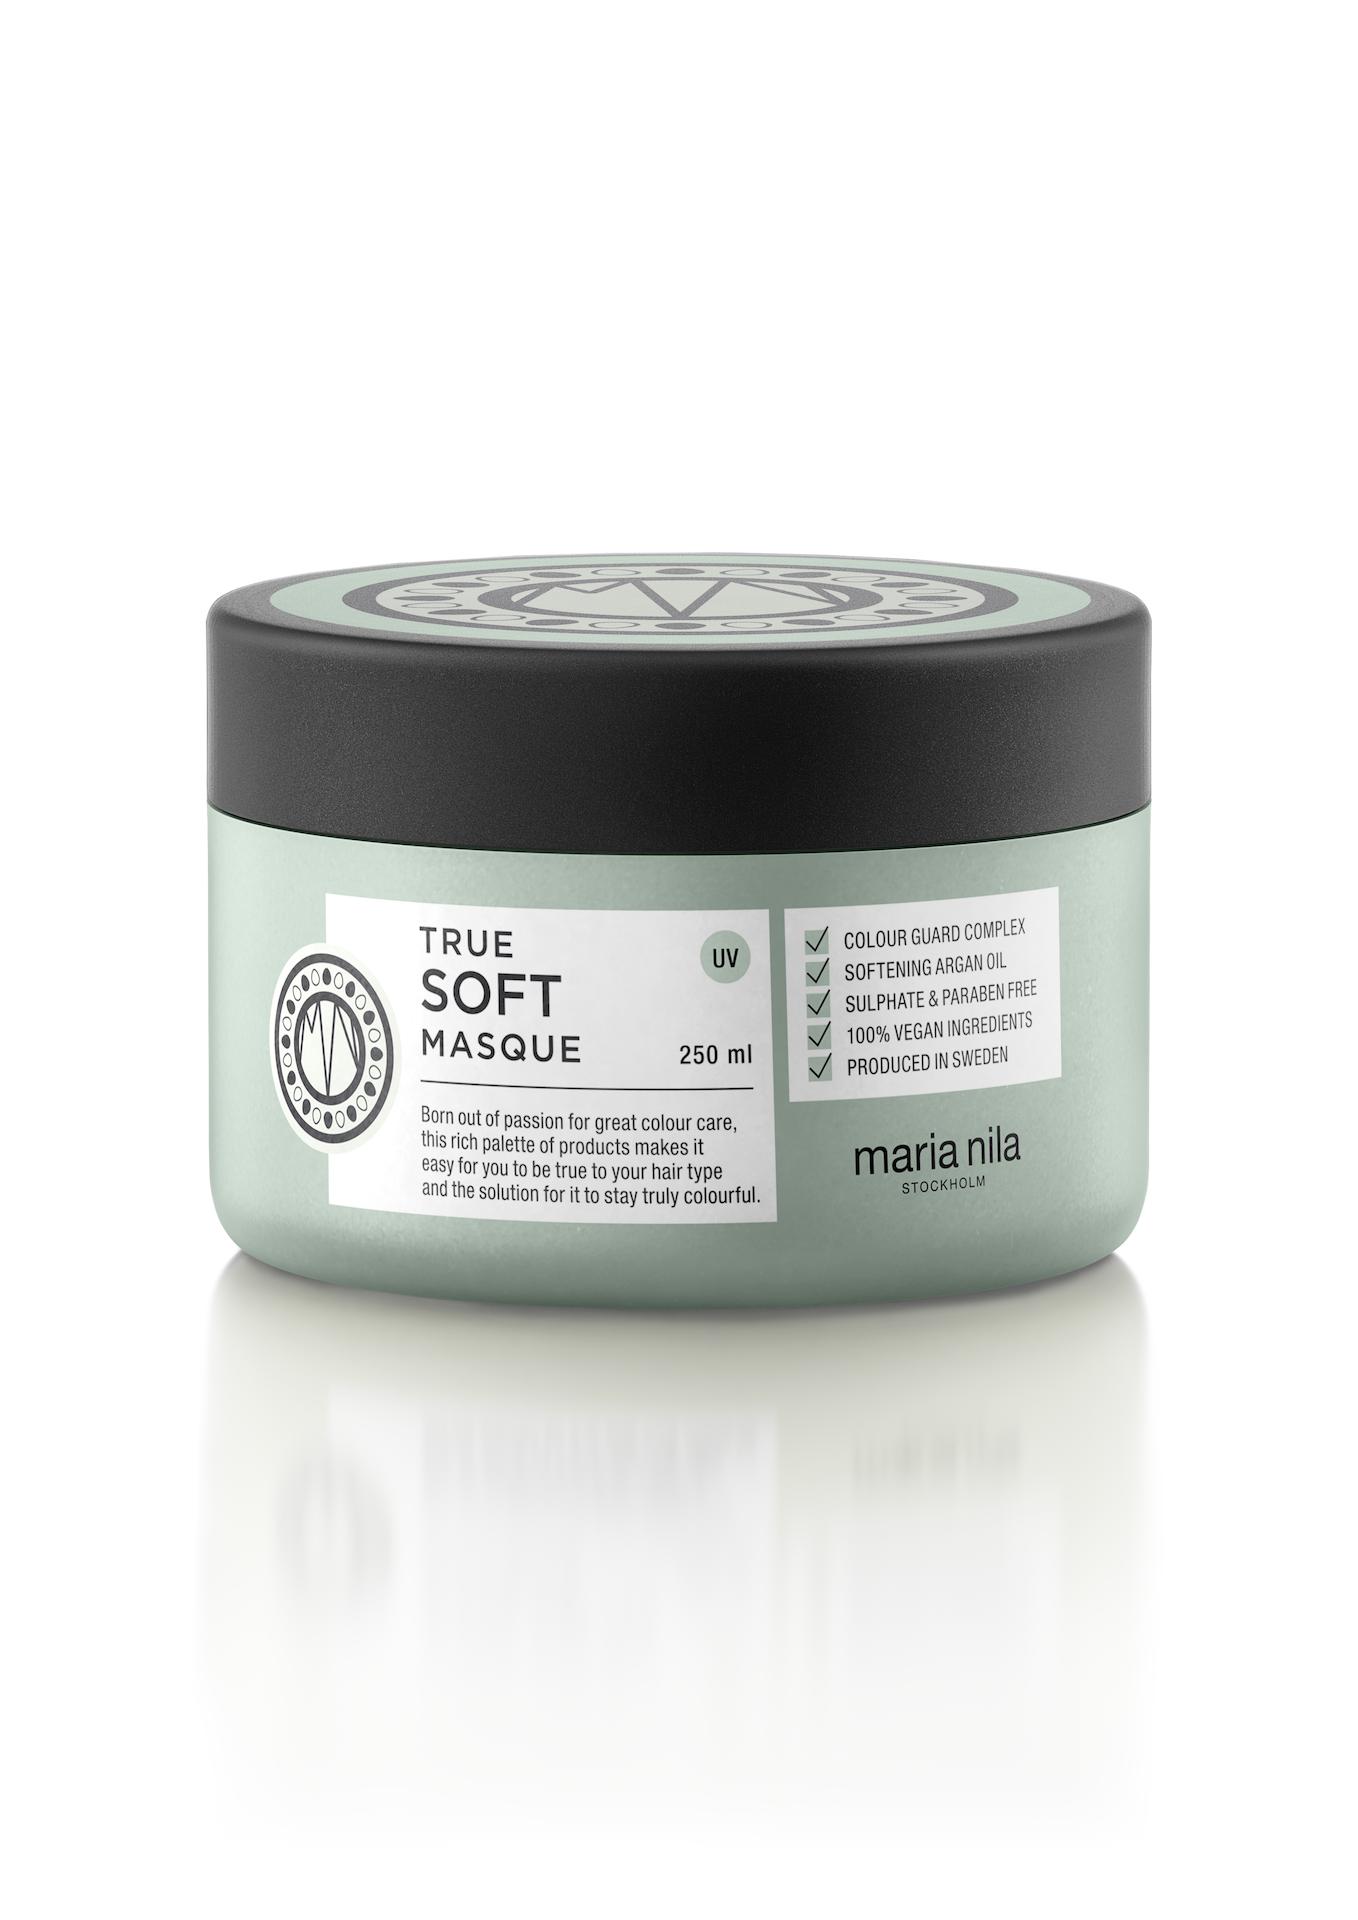 True Soft Masque 250ml